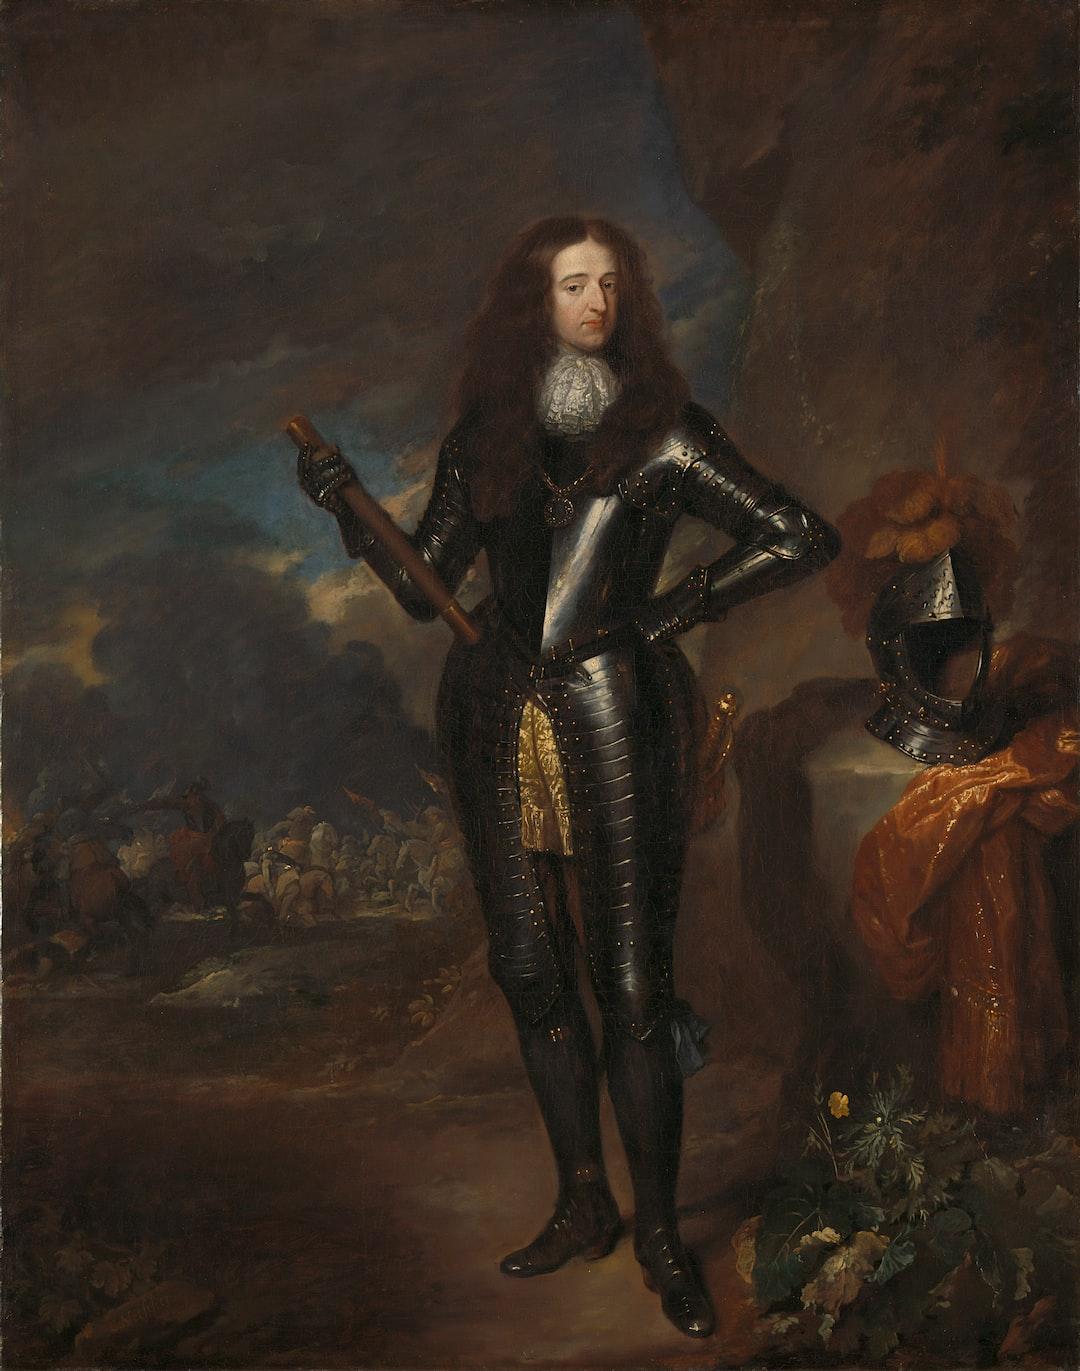 Title: Portrait of William III, Prince of Orange and Stadholder. Date: 1683. Institution: Rijksmuseum. Provider: Rijksmuseum. Providing Country: Netherlands. Public Domain